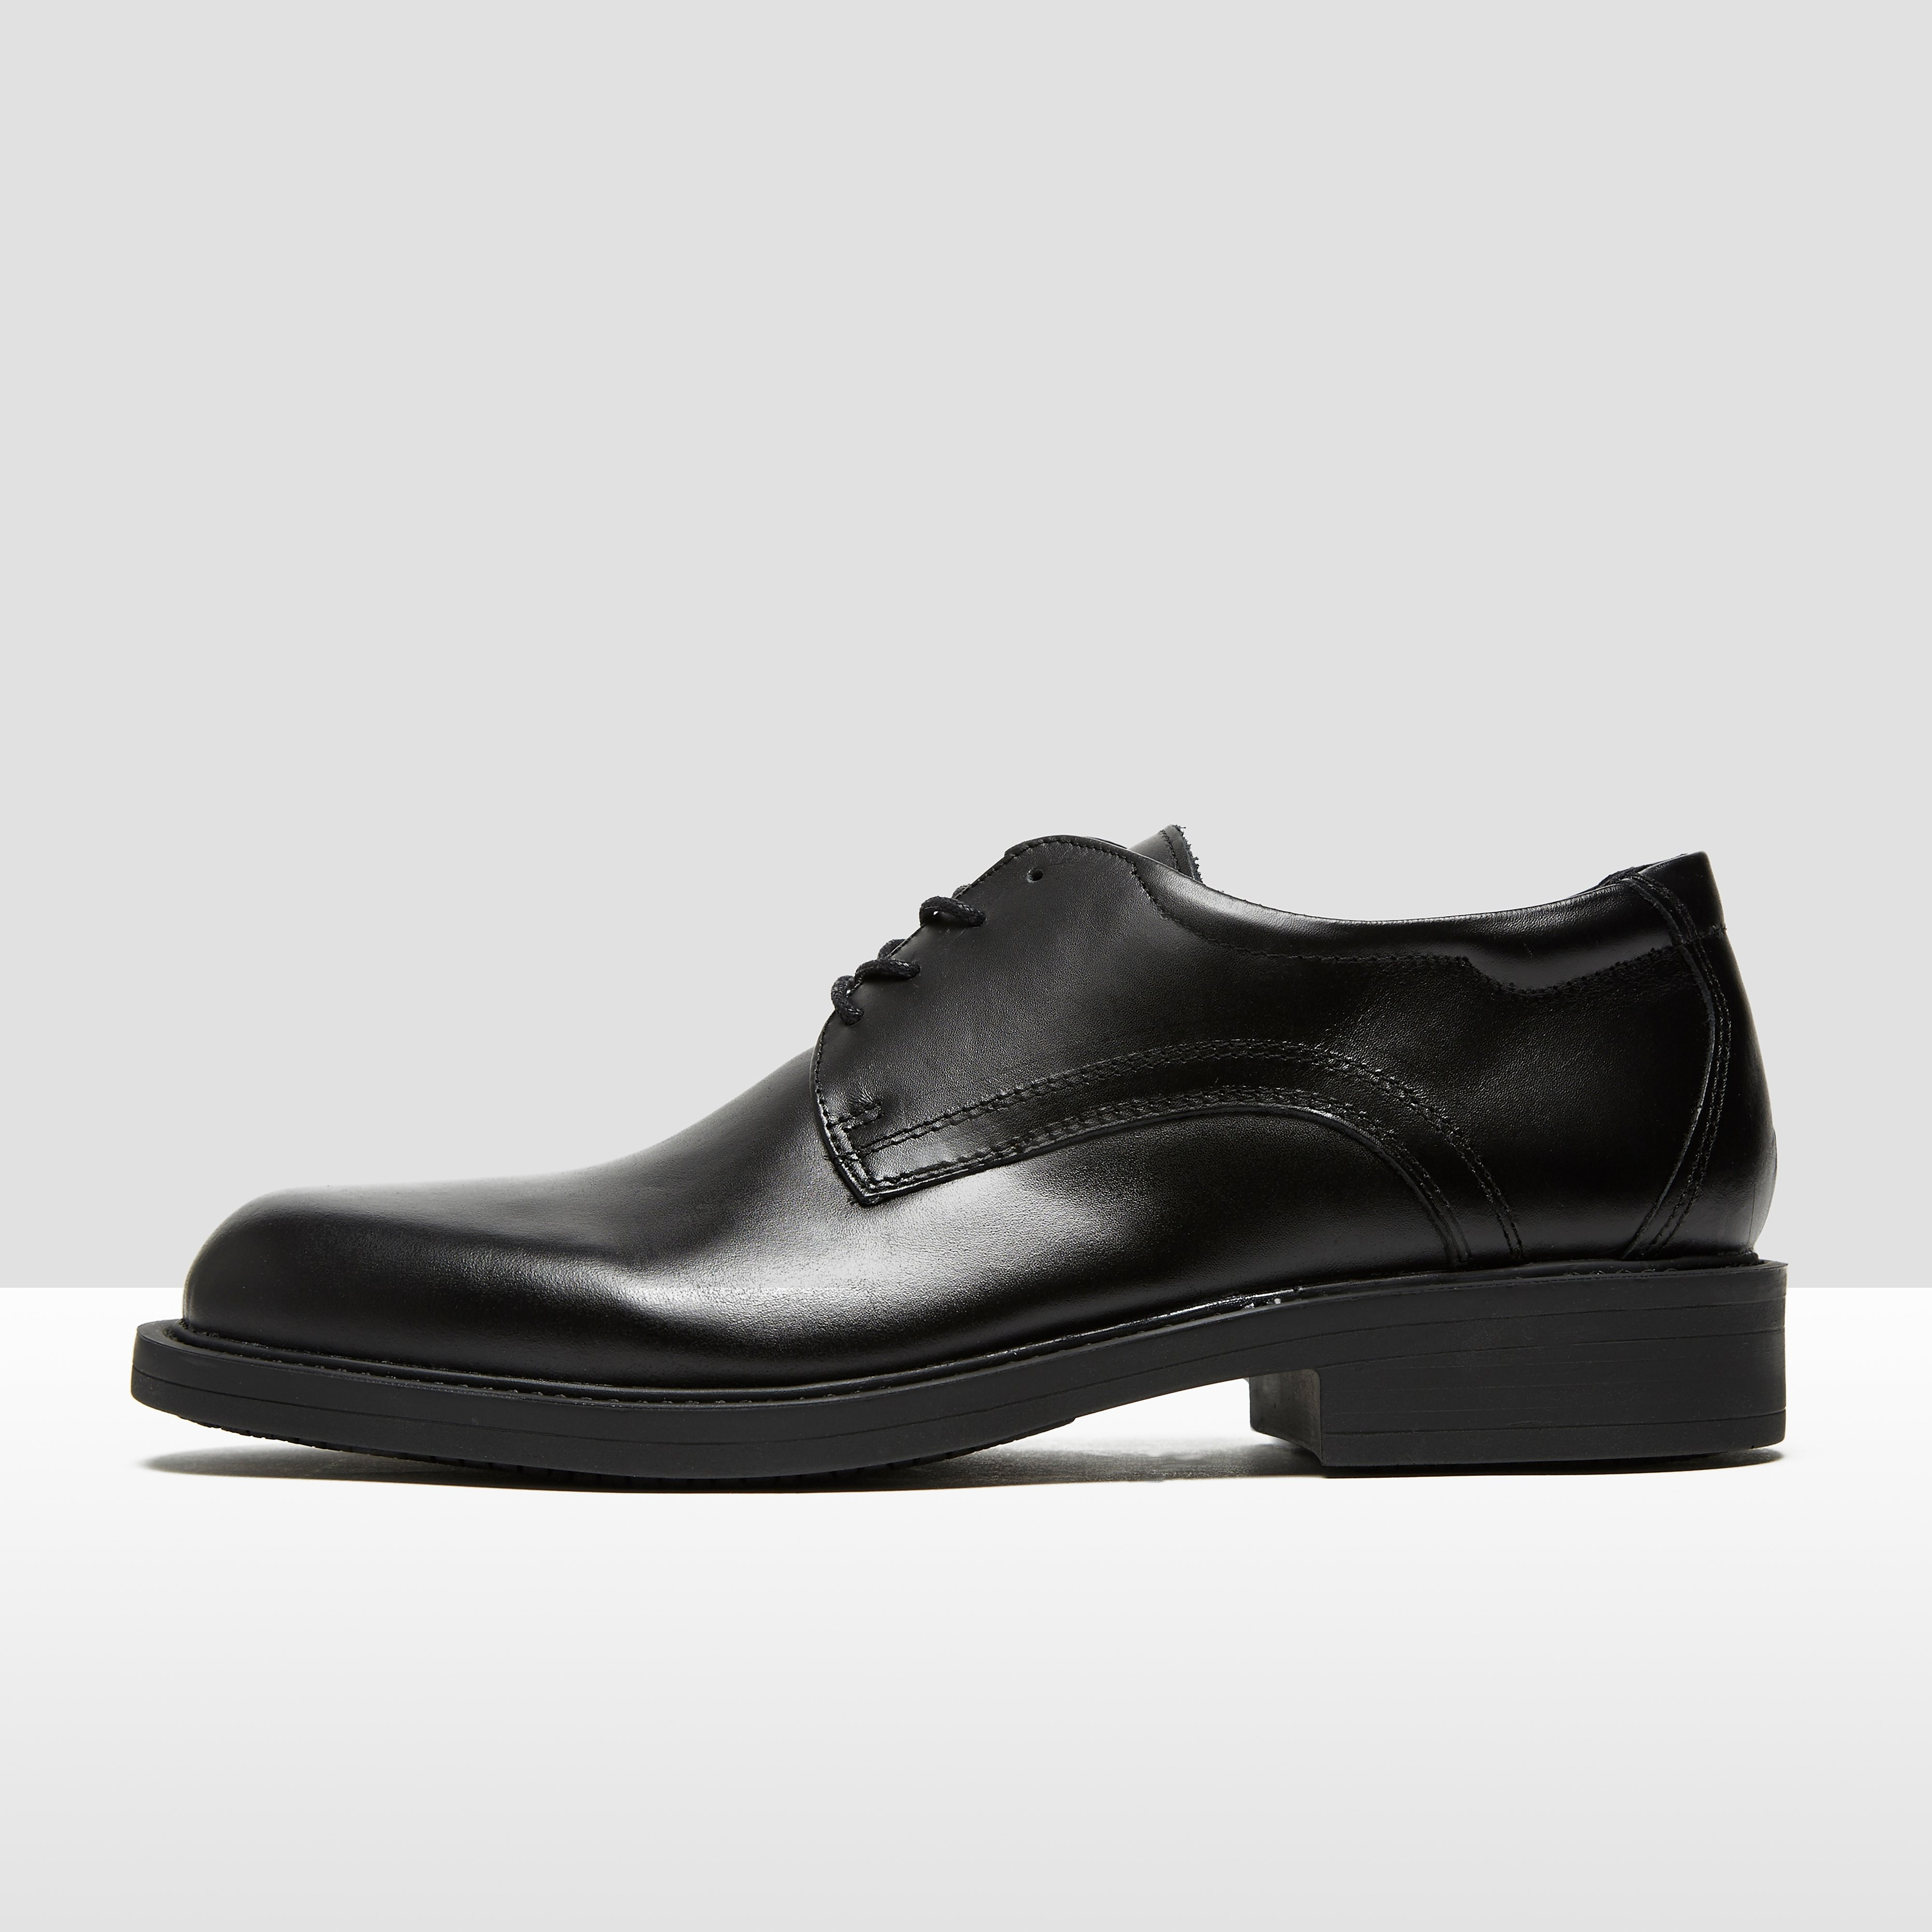 Magnum Unisex Active Duty Anti-Slip Uniform Shoe